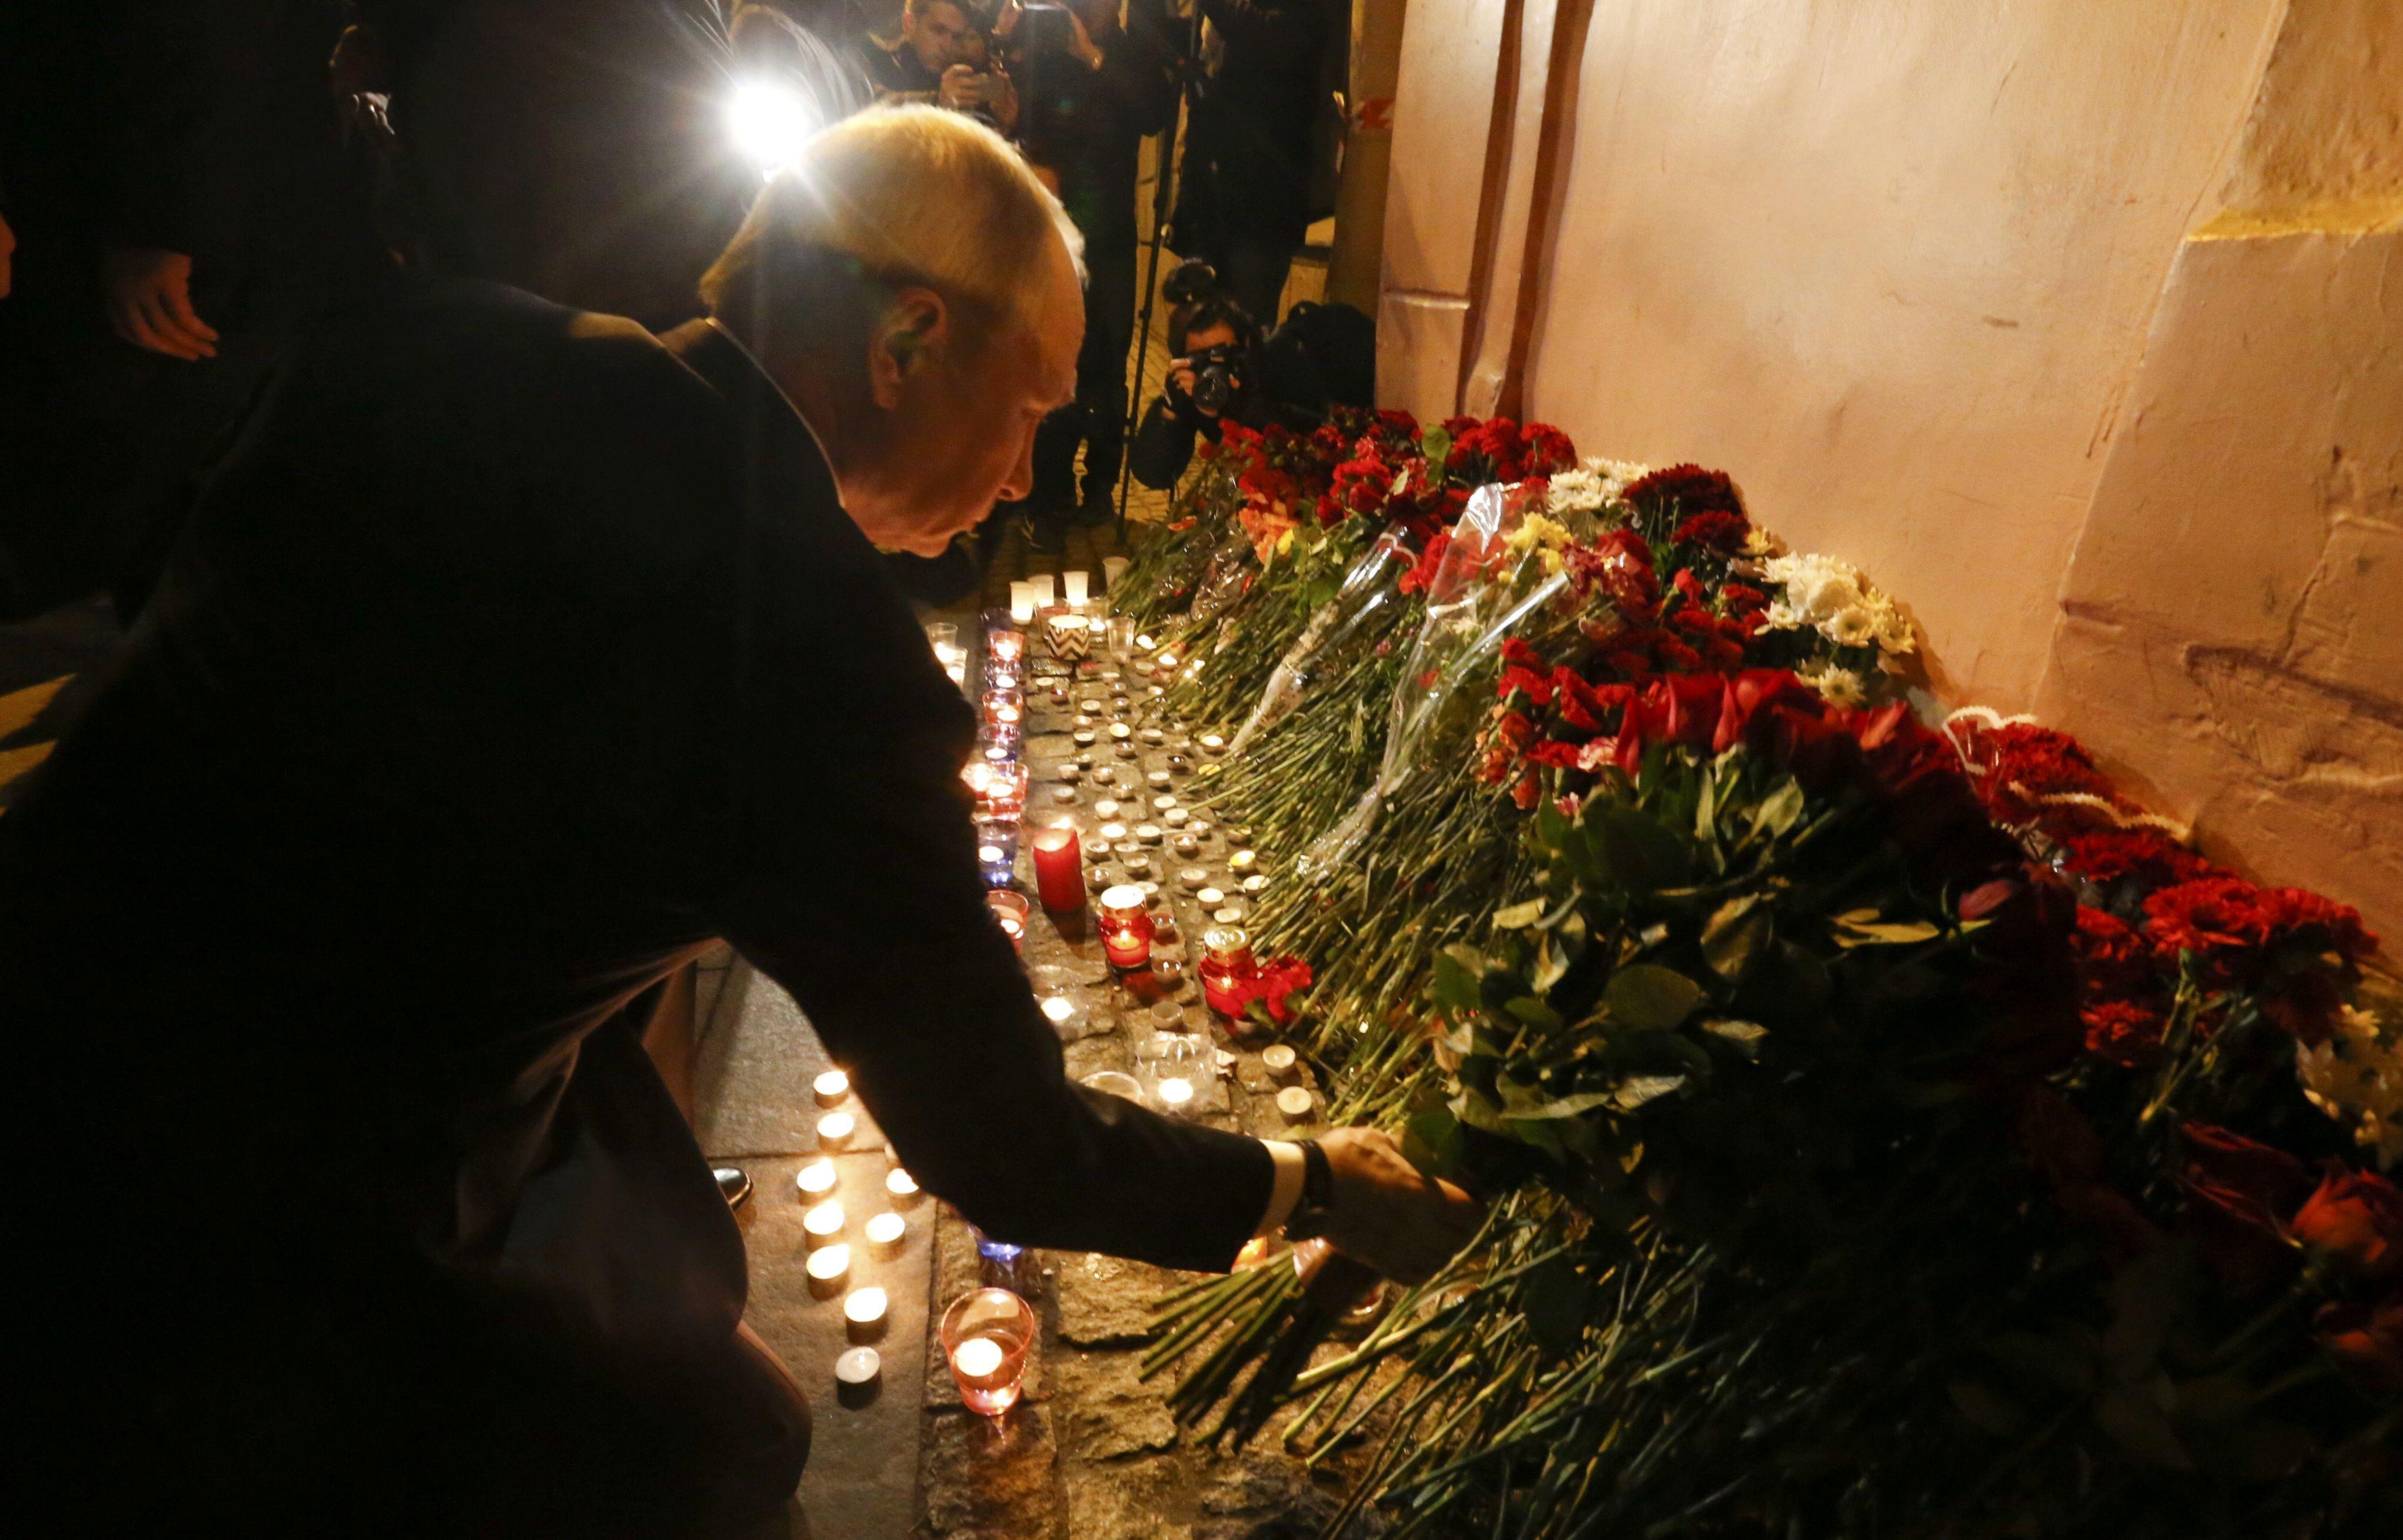 Russian president Vladimir Putin puts flowers down outside Tekhnologicheskiy Institut metro station in St. Petersburg, Russia on April 3, 2017. (REUTERS/Grigory Duko)